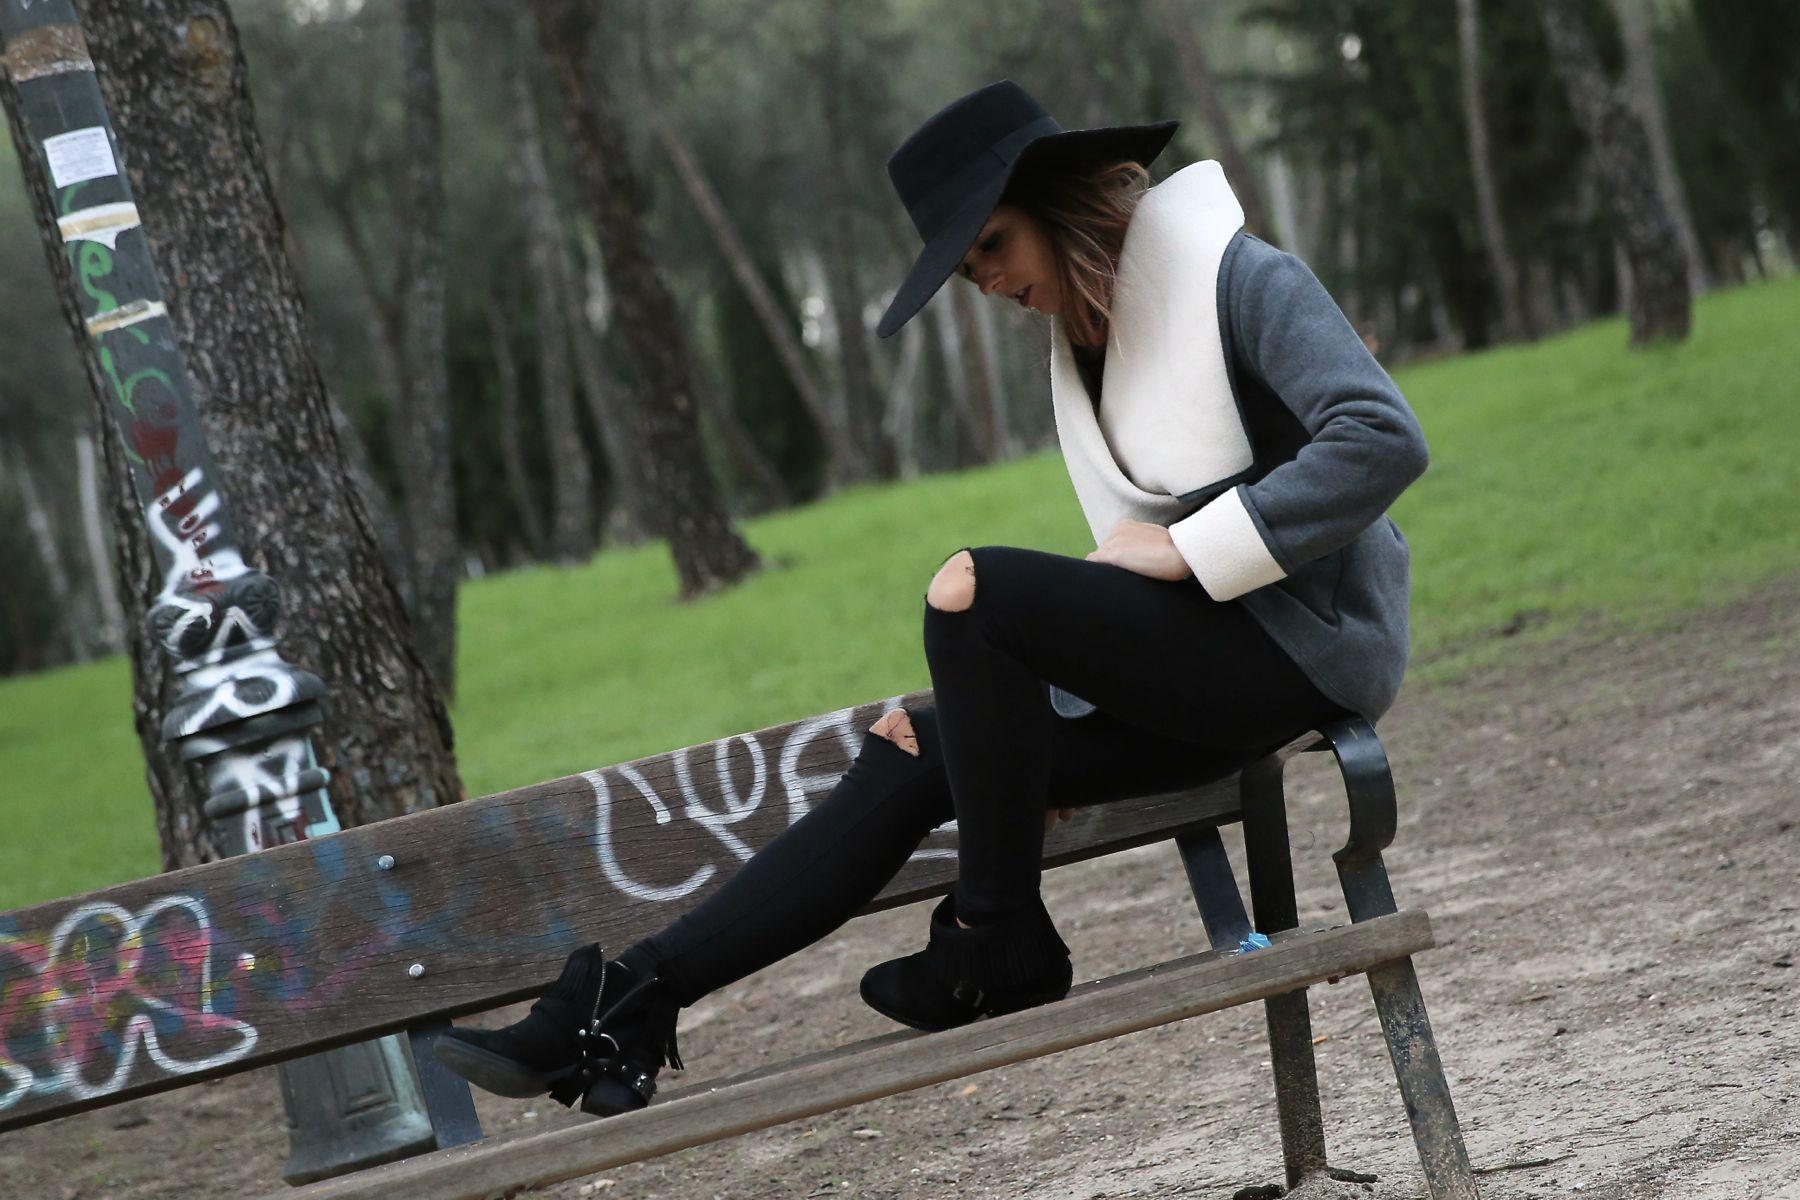 trendy_taste-look-outfit-street_style-ootd-blog-blogger-fashion_spain-moda_españa-abrigo_borrego-borreguillo-otoño-frio-cold-hat-sombrero-boho-hippie-steve_madden-skinny_jeans-pitillos-fall-9